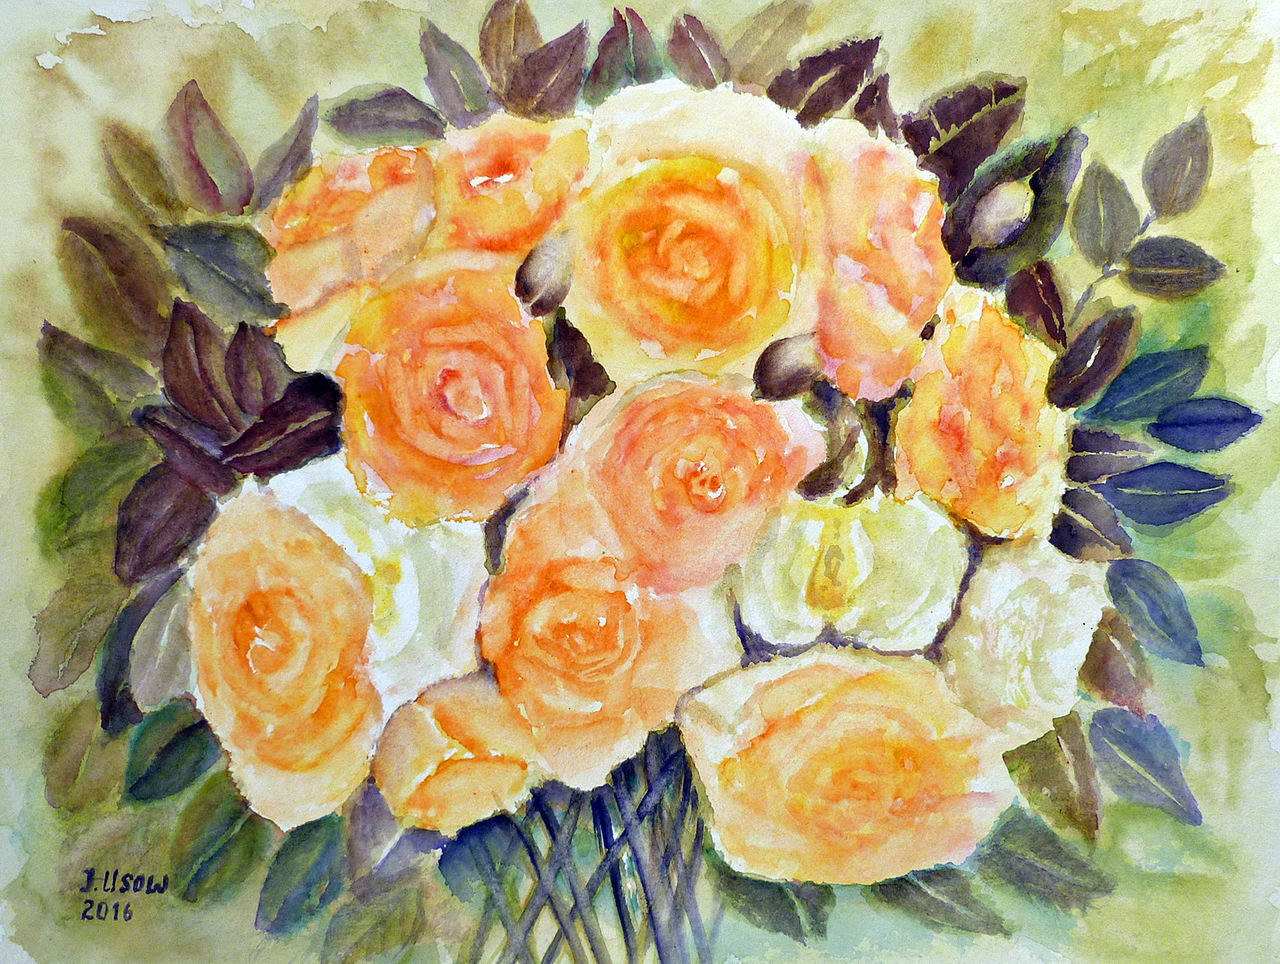 rosenstrau aquarellmalerei stillleben rosenstrau rose von irina usova bei kunstnet. Black Bedroom Furniture Sets. Home Design Ideas